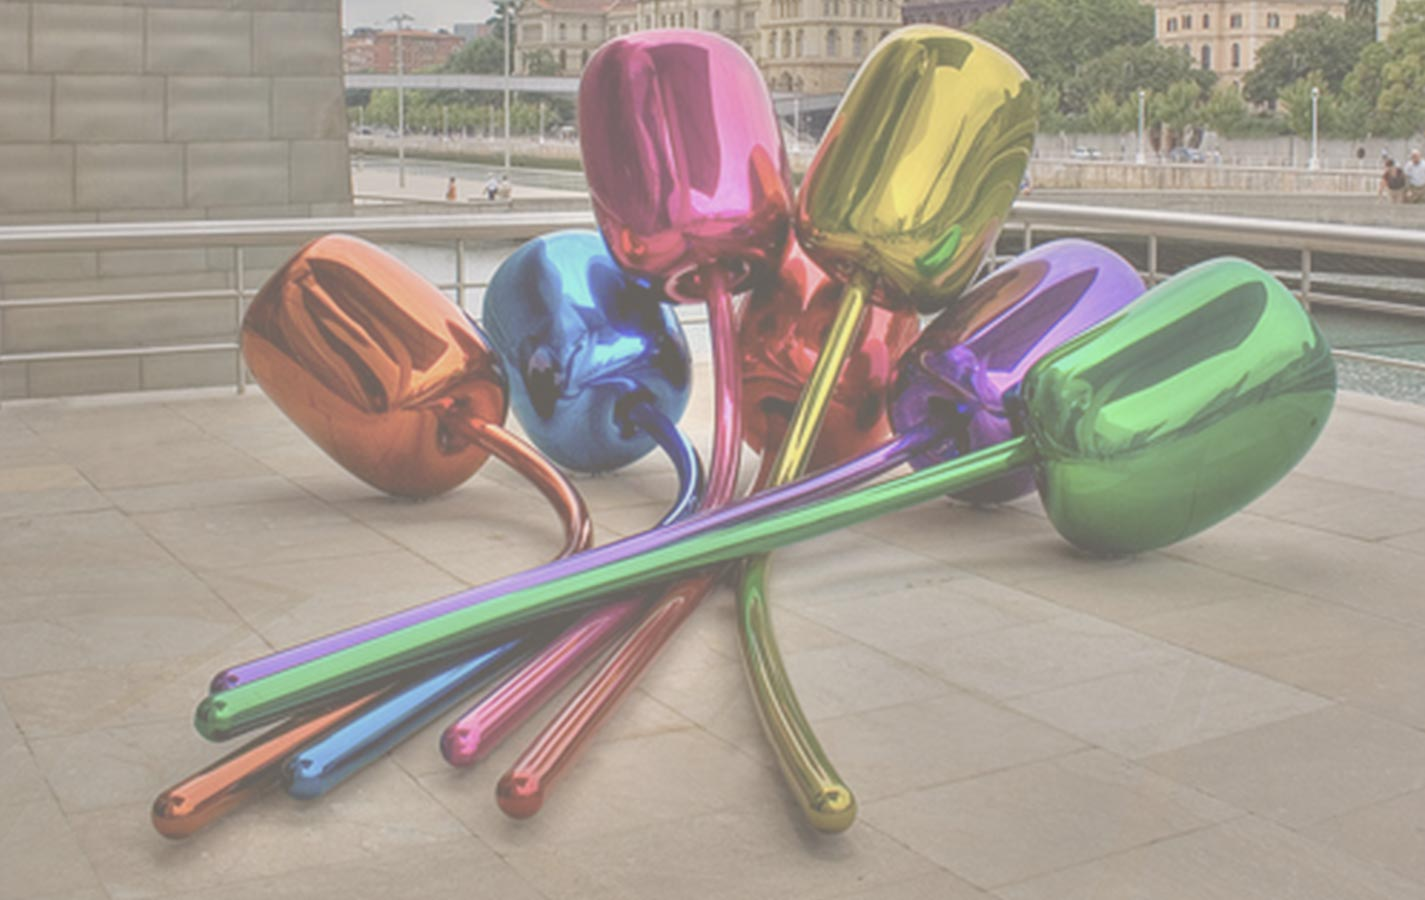 Jeff Koons: Inaugura esta polémica escultura en París